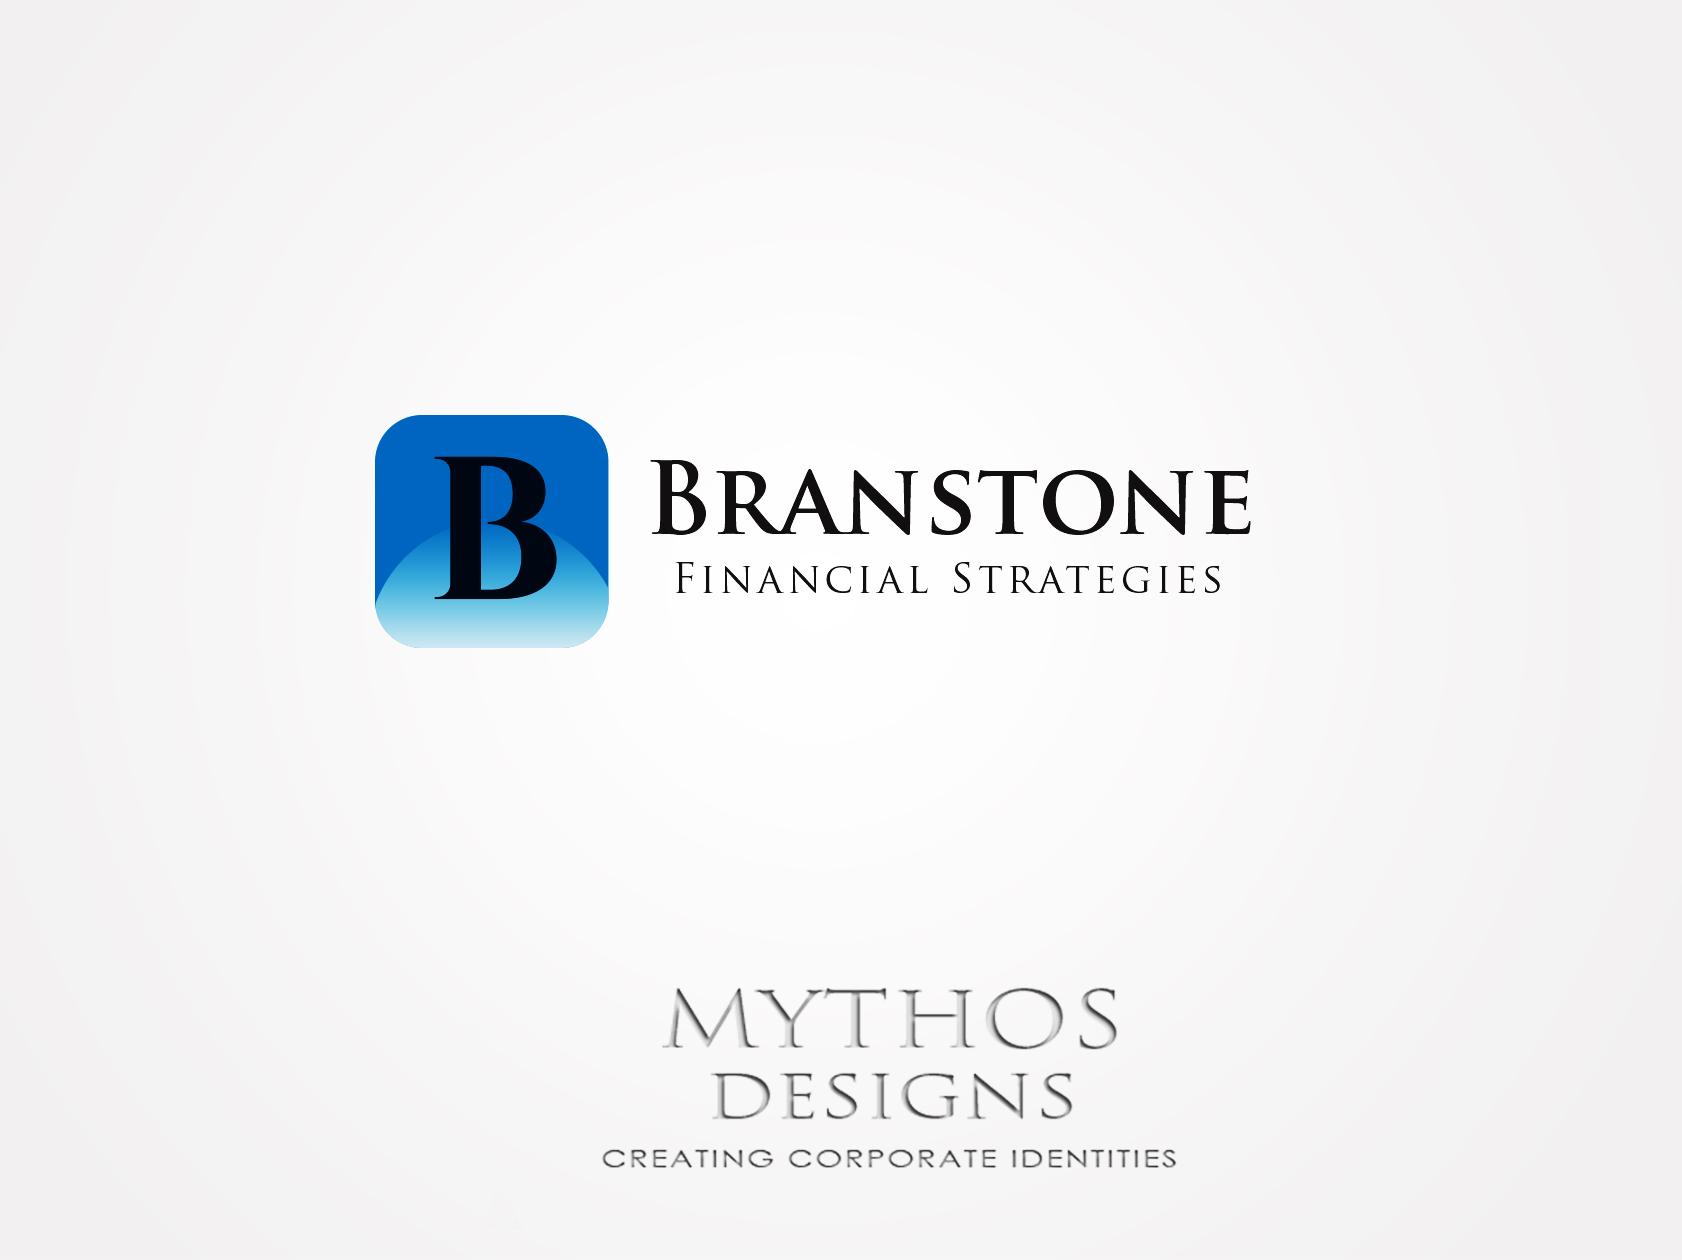 Logo Design by Mythos Designs - Entry No. 2 in the Logo Design Contest Inspiring Logo Design for Branstone Financial Strategies.